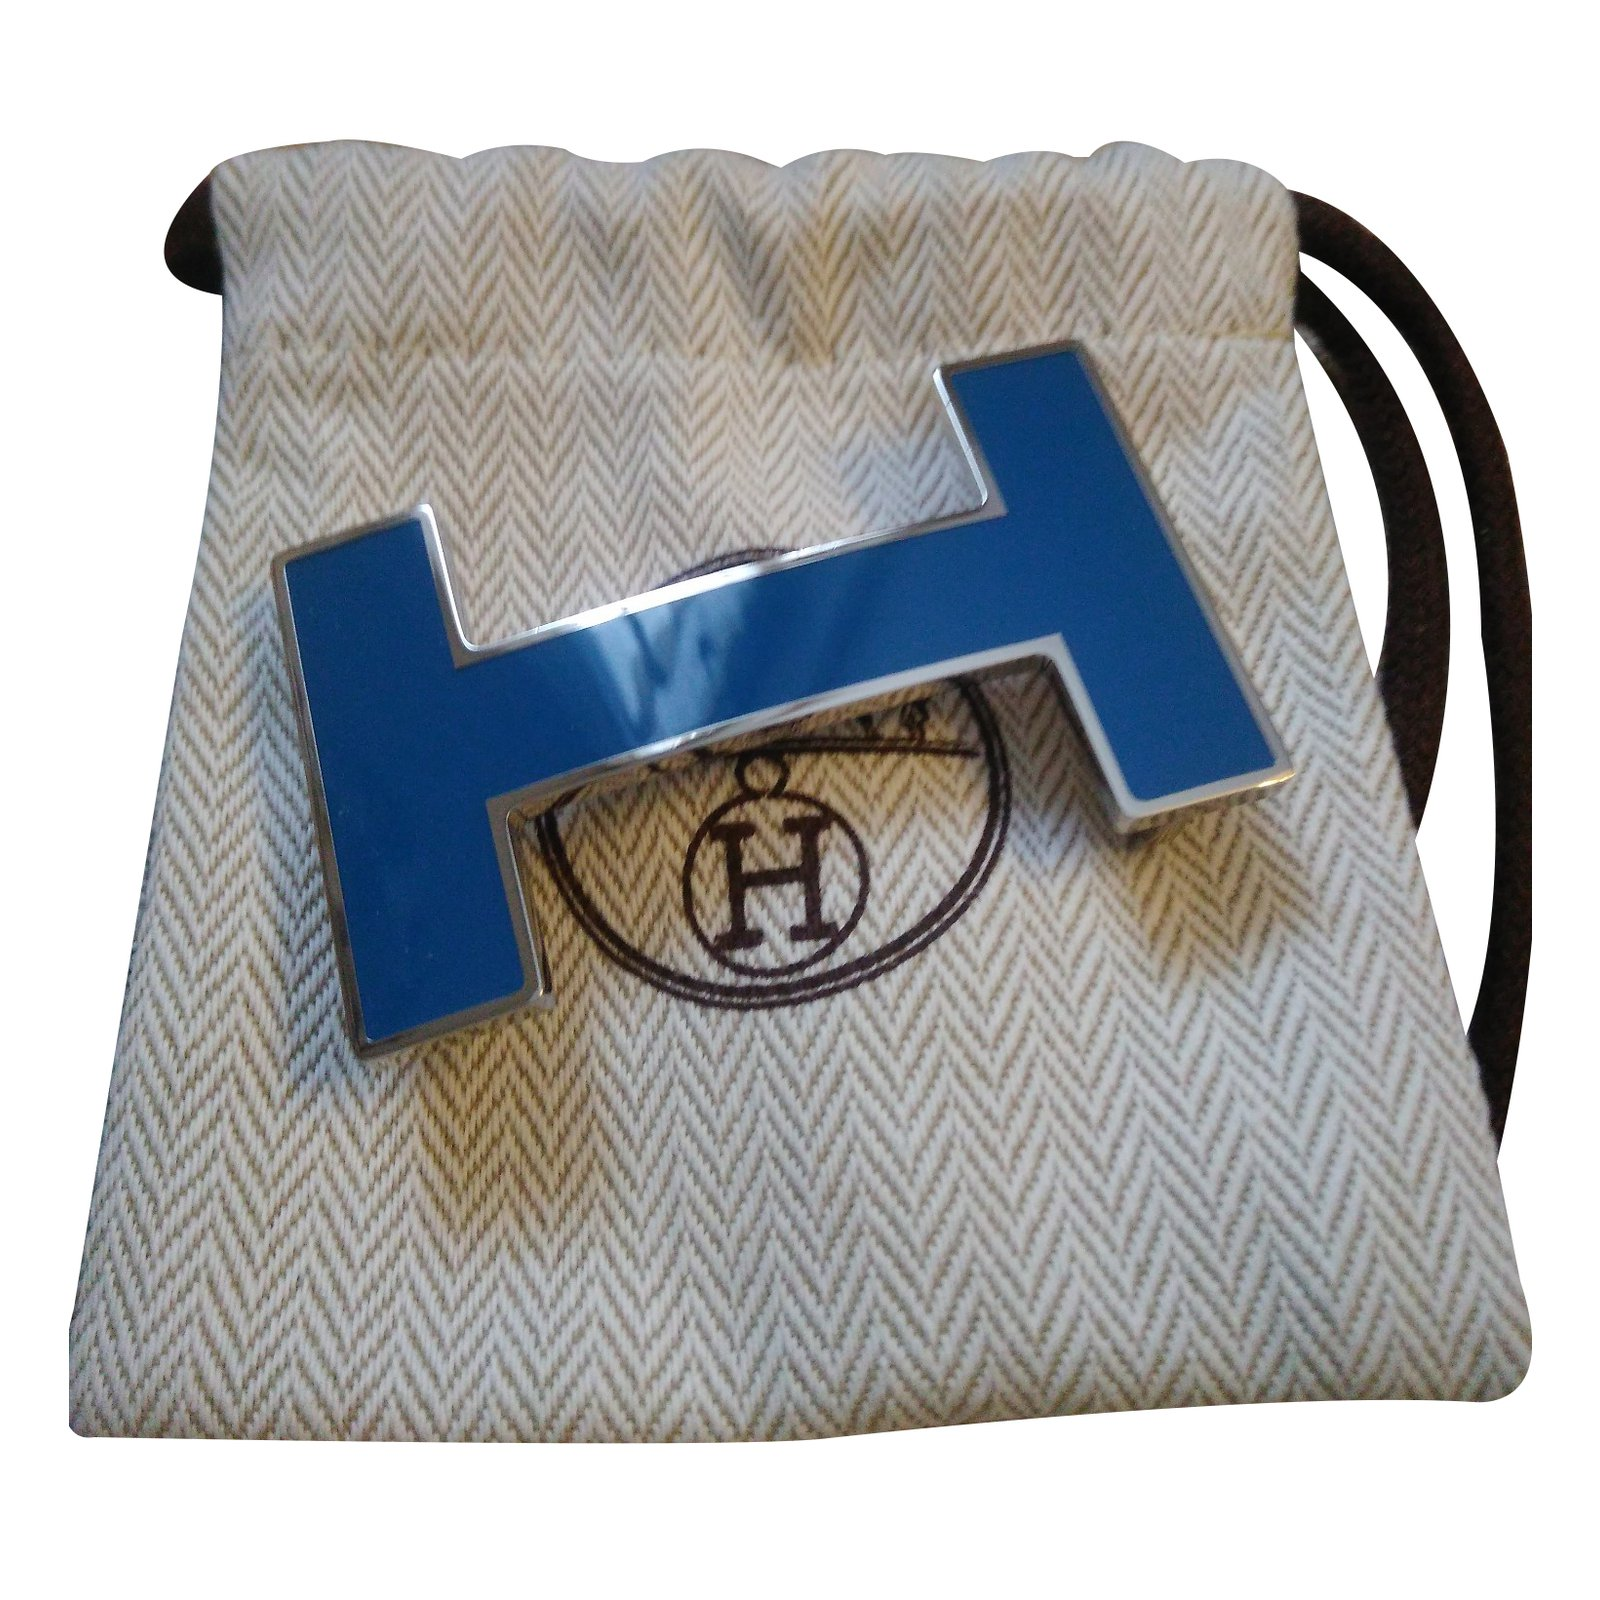 Ceintures Hermès Laque mykonos Autre Bleu ref.30981 - Joli Closet 5cd14abd3ee